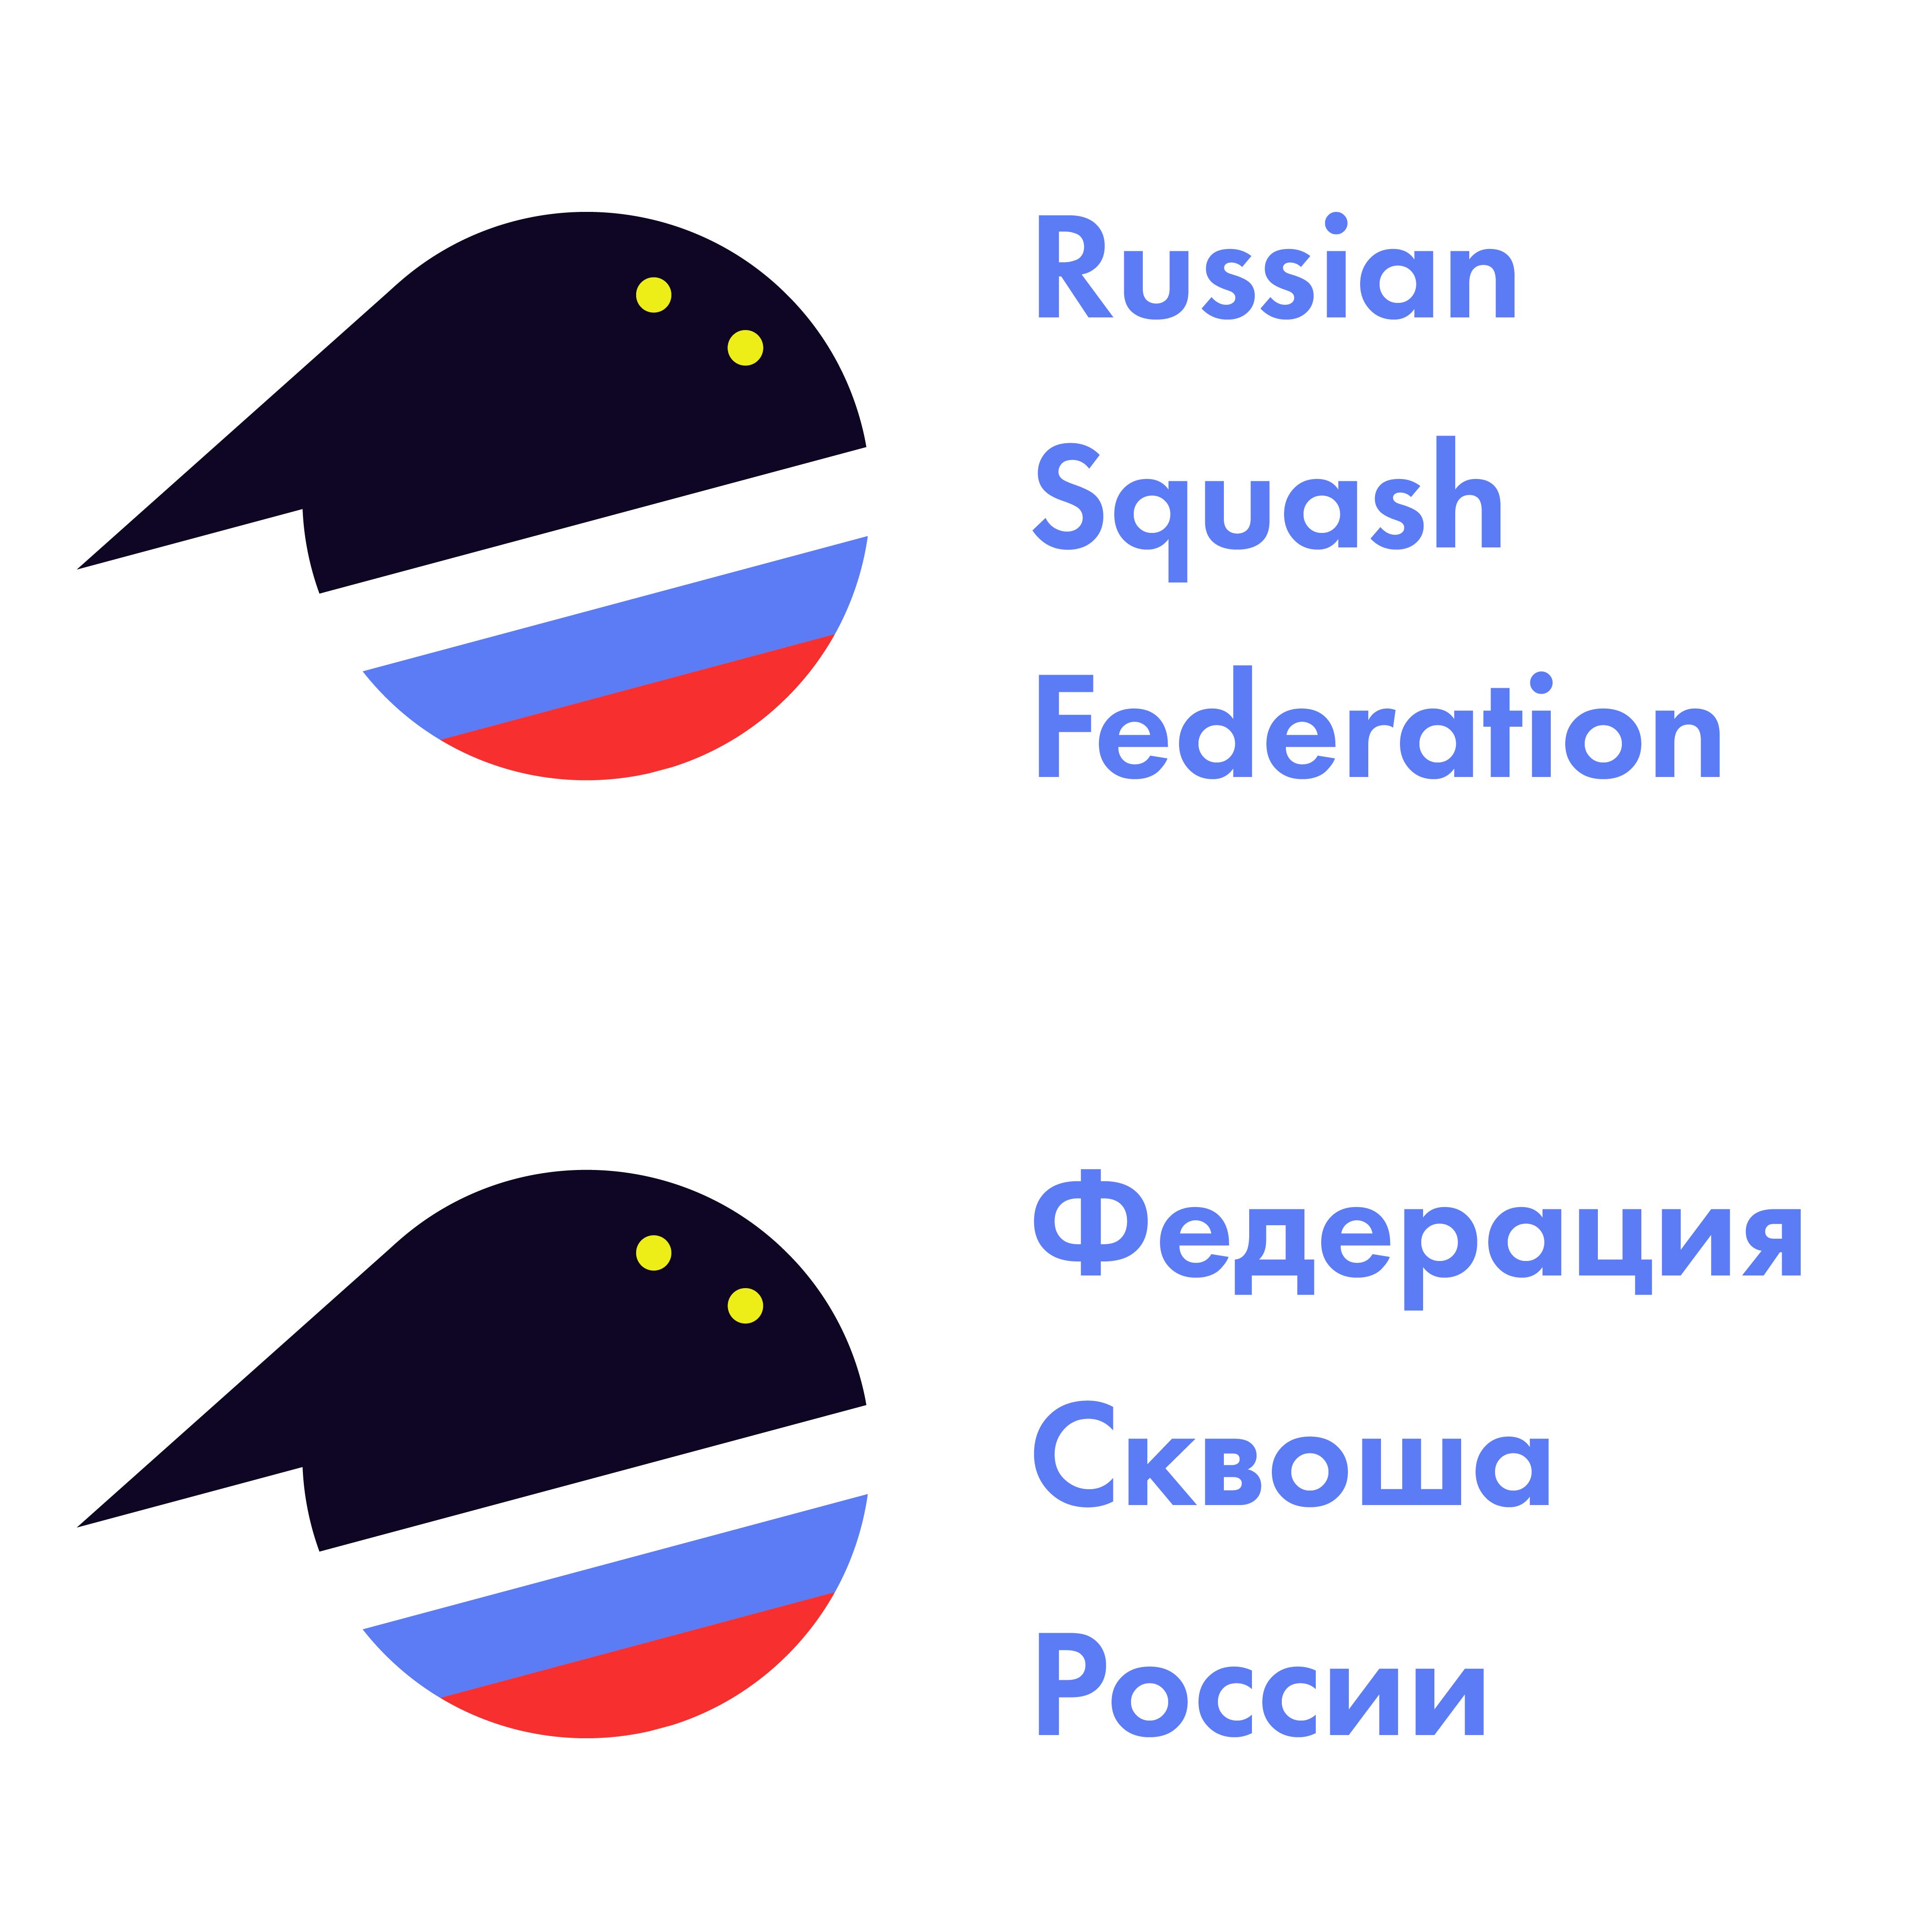 Разработать логотип для Федерации сквоша России фото f_1435f37d701061ea.png